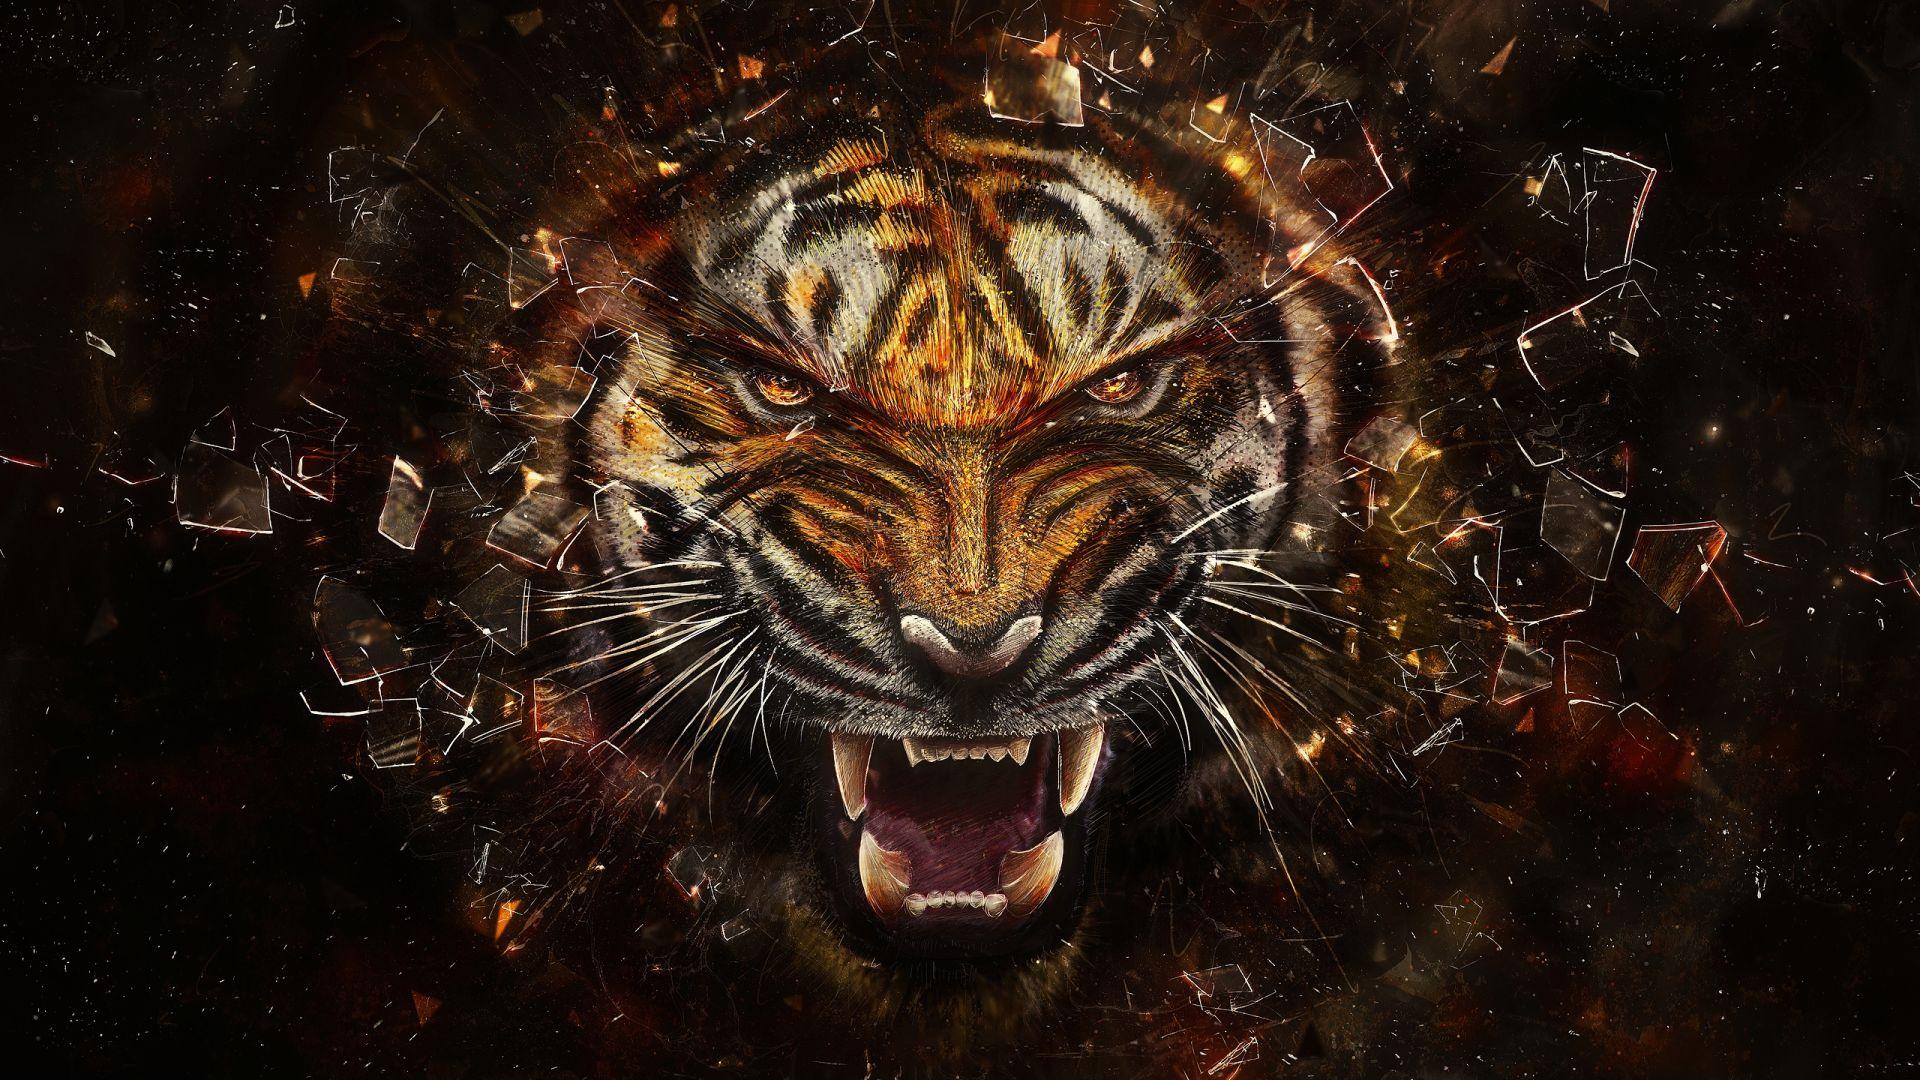 Tiger Art Angry, HD Wallpaper 1080